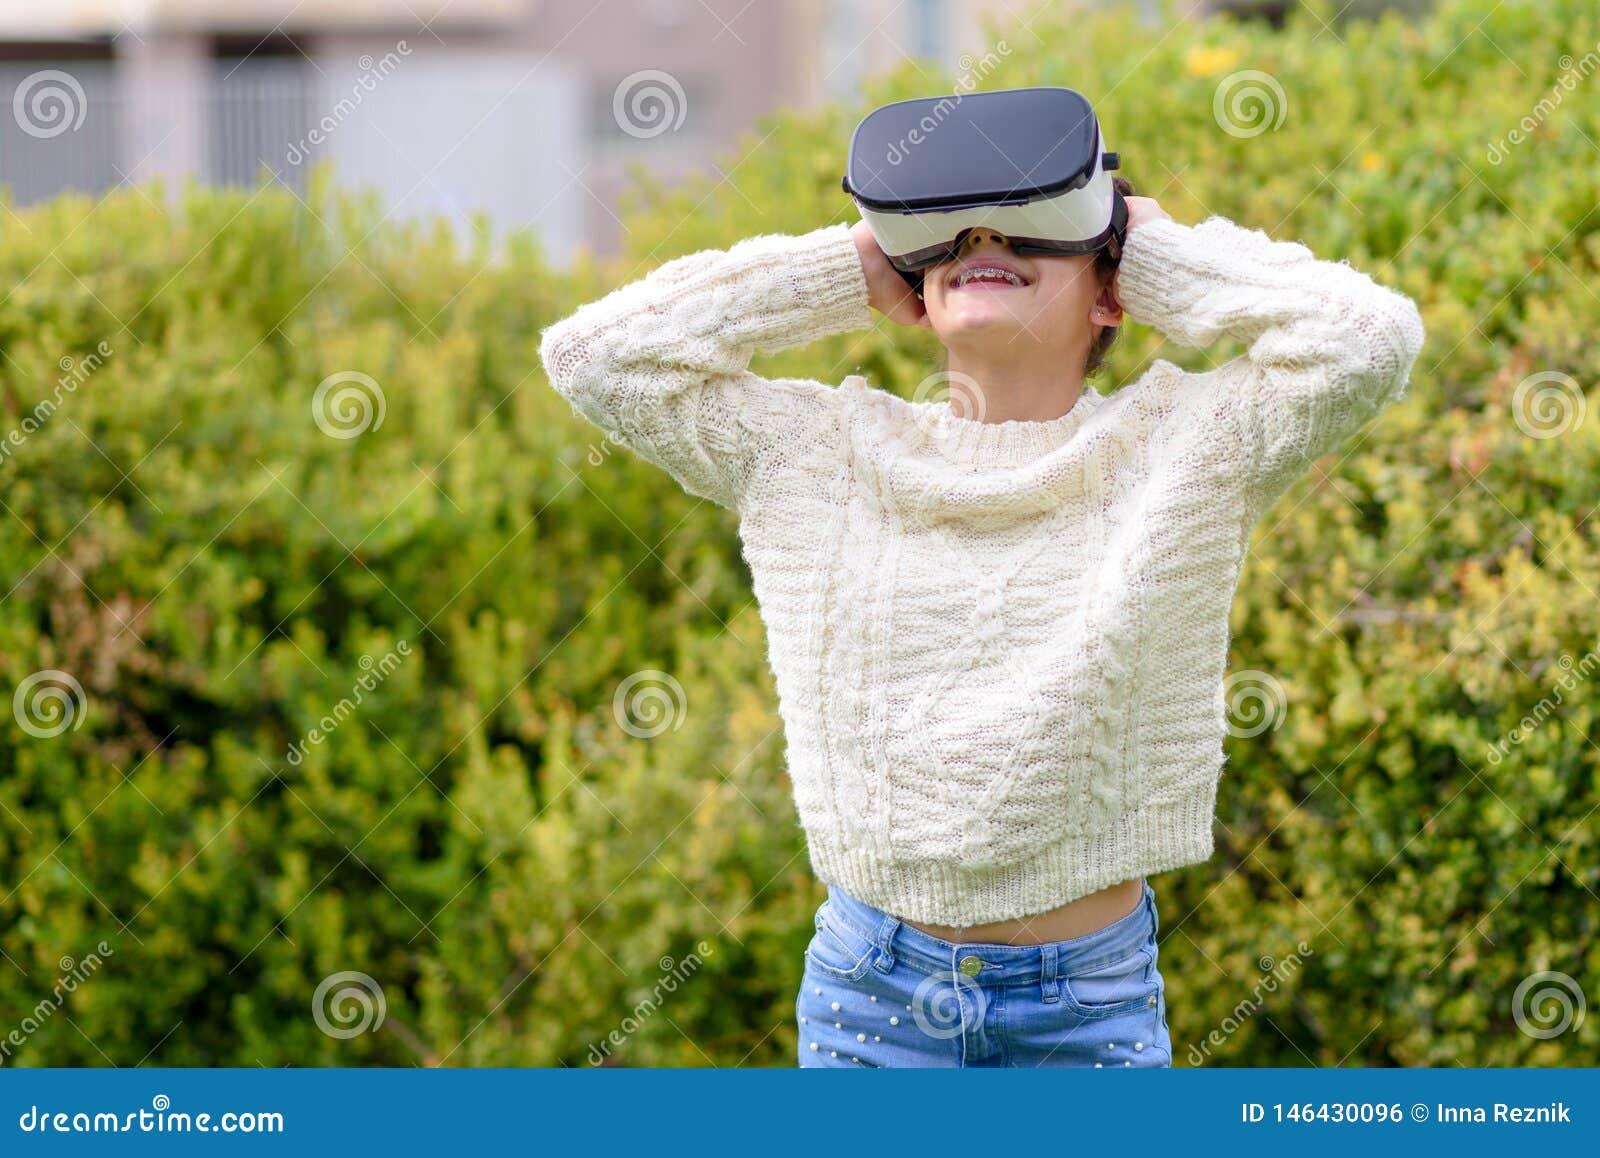 Teen Girl With Virtual Reality Headset